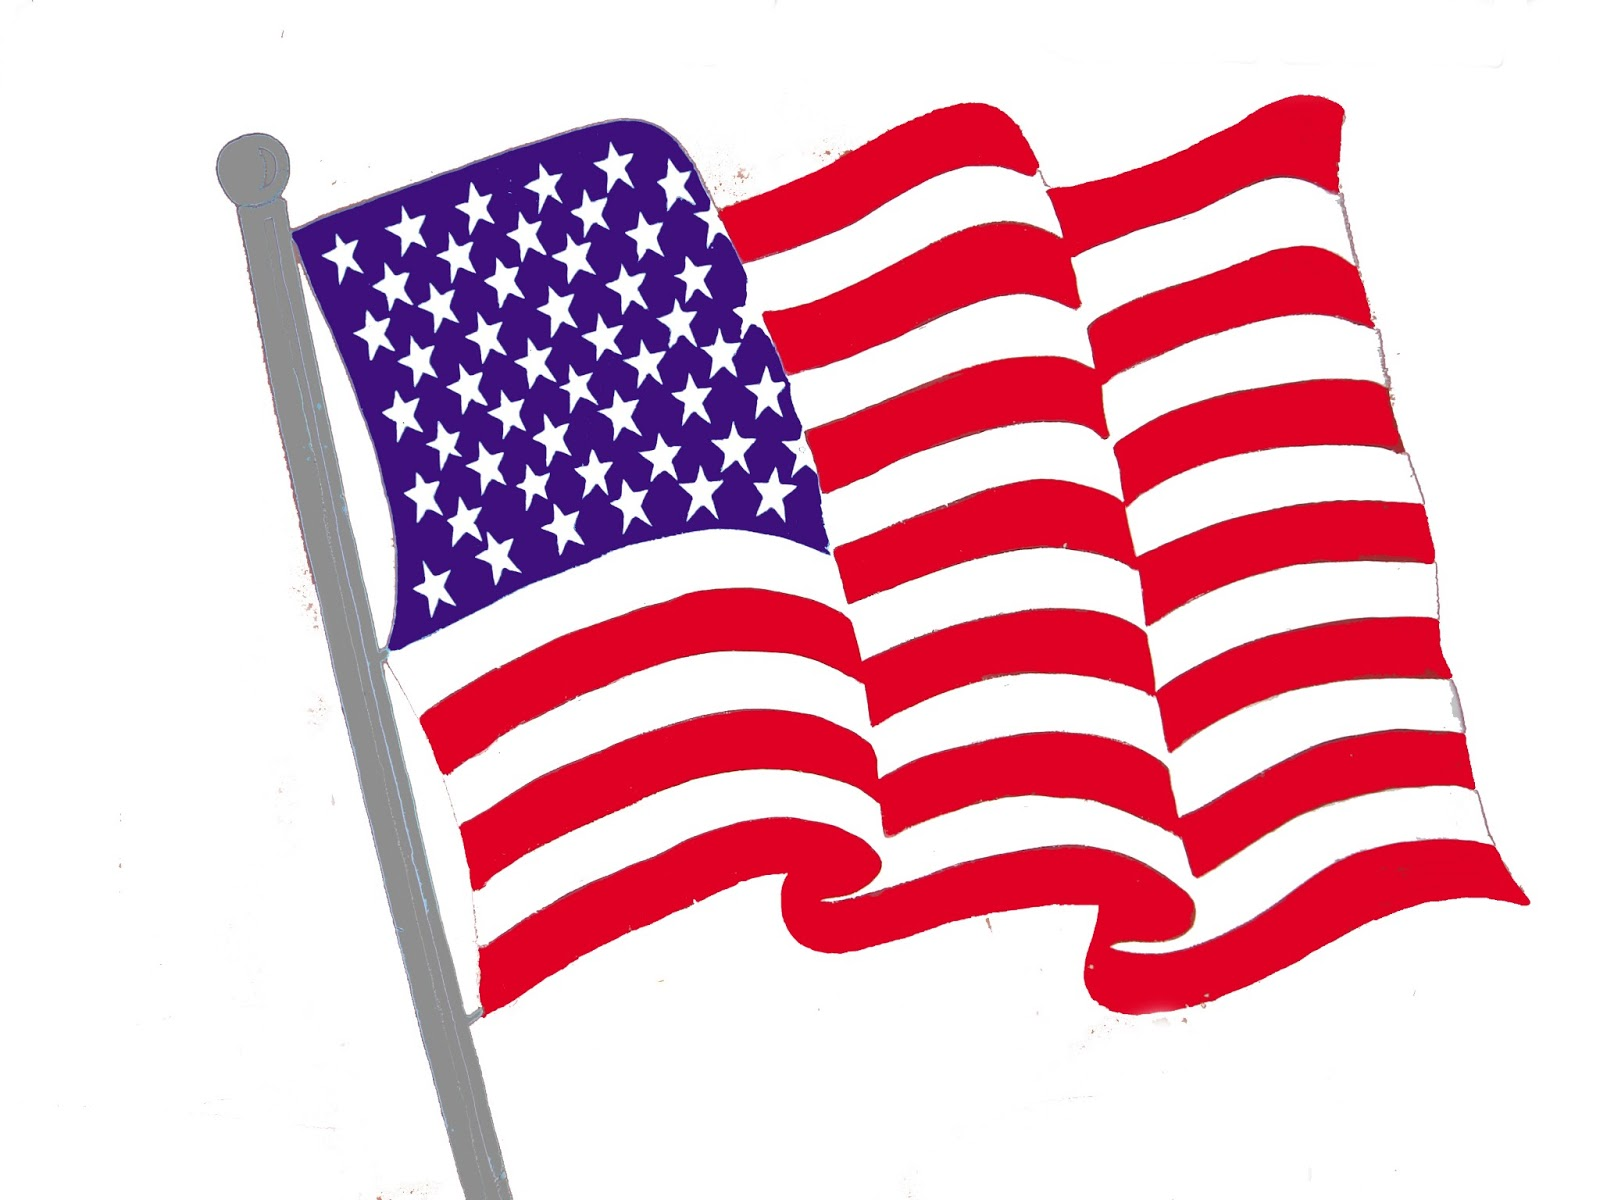 D70d8107dbf587f446021b6deb1c14 ... D70d8-d70d8107dbf587f446021b6deb1c14 ... d70d8107dbf587f446021b6deb1c14 ... Waving American Flag Clip Art . ...-10